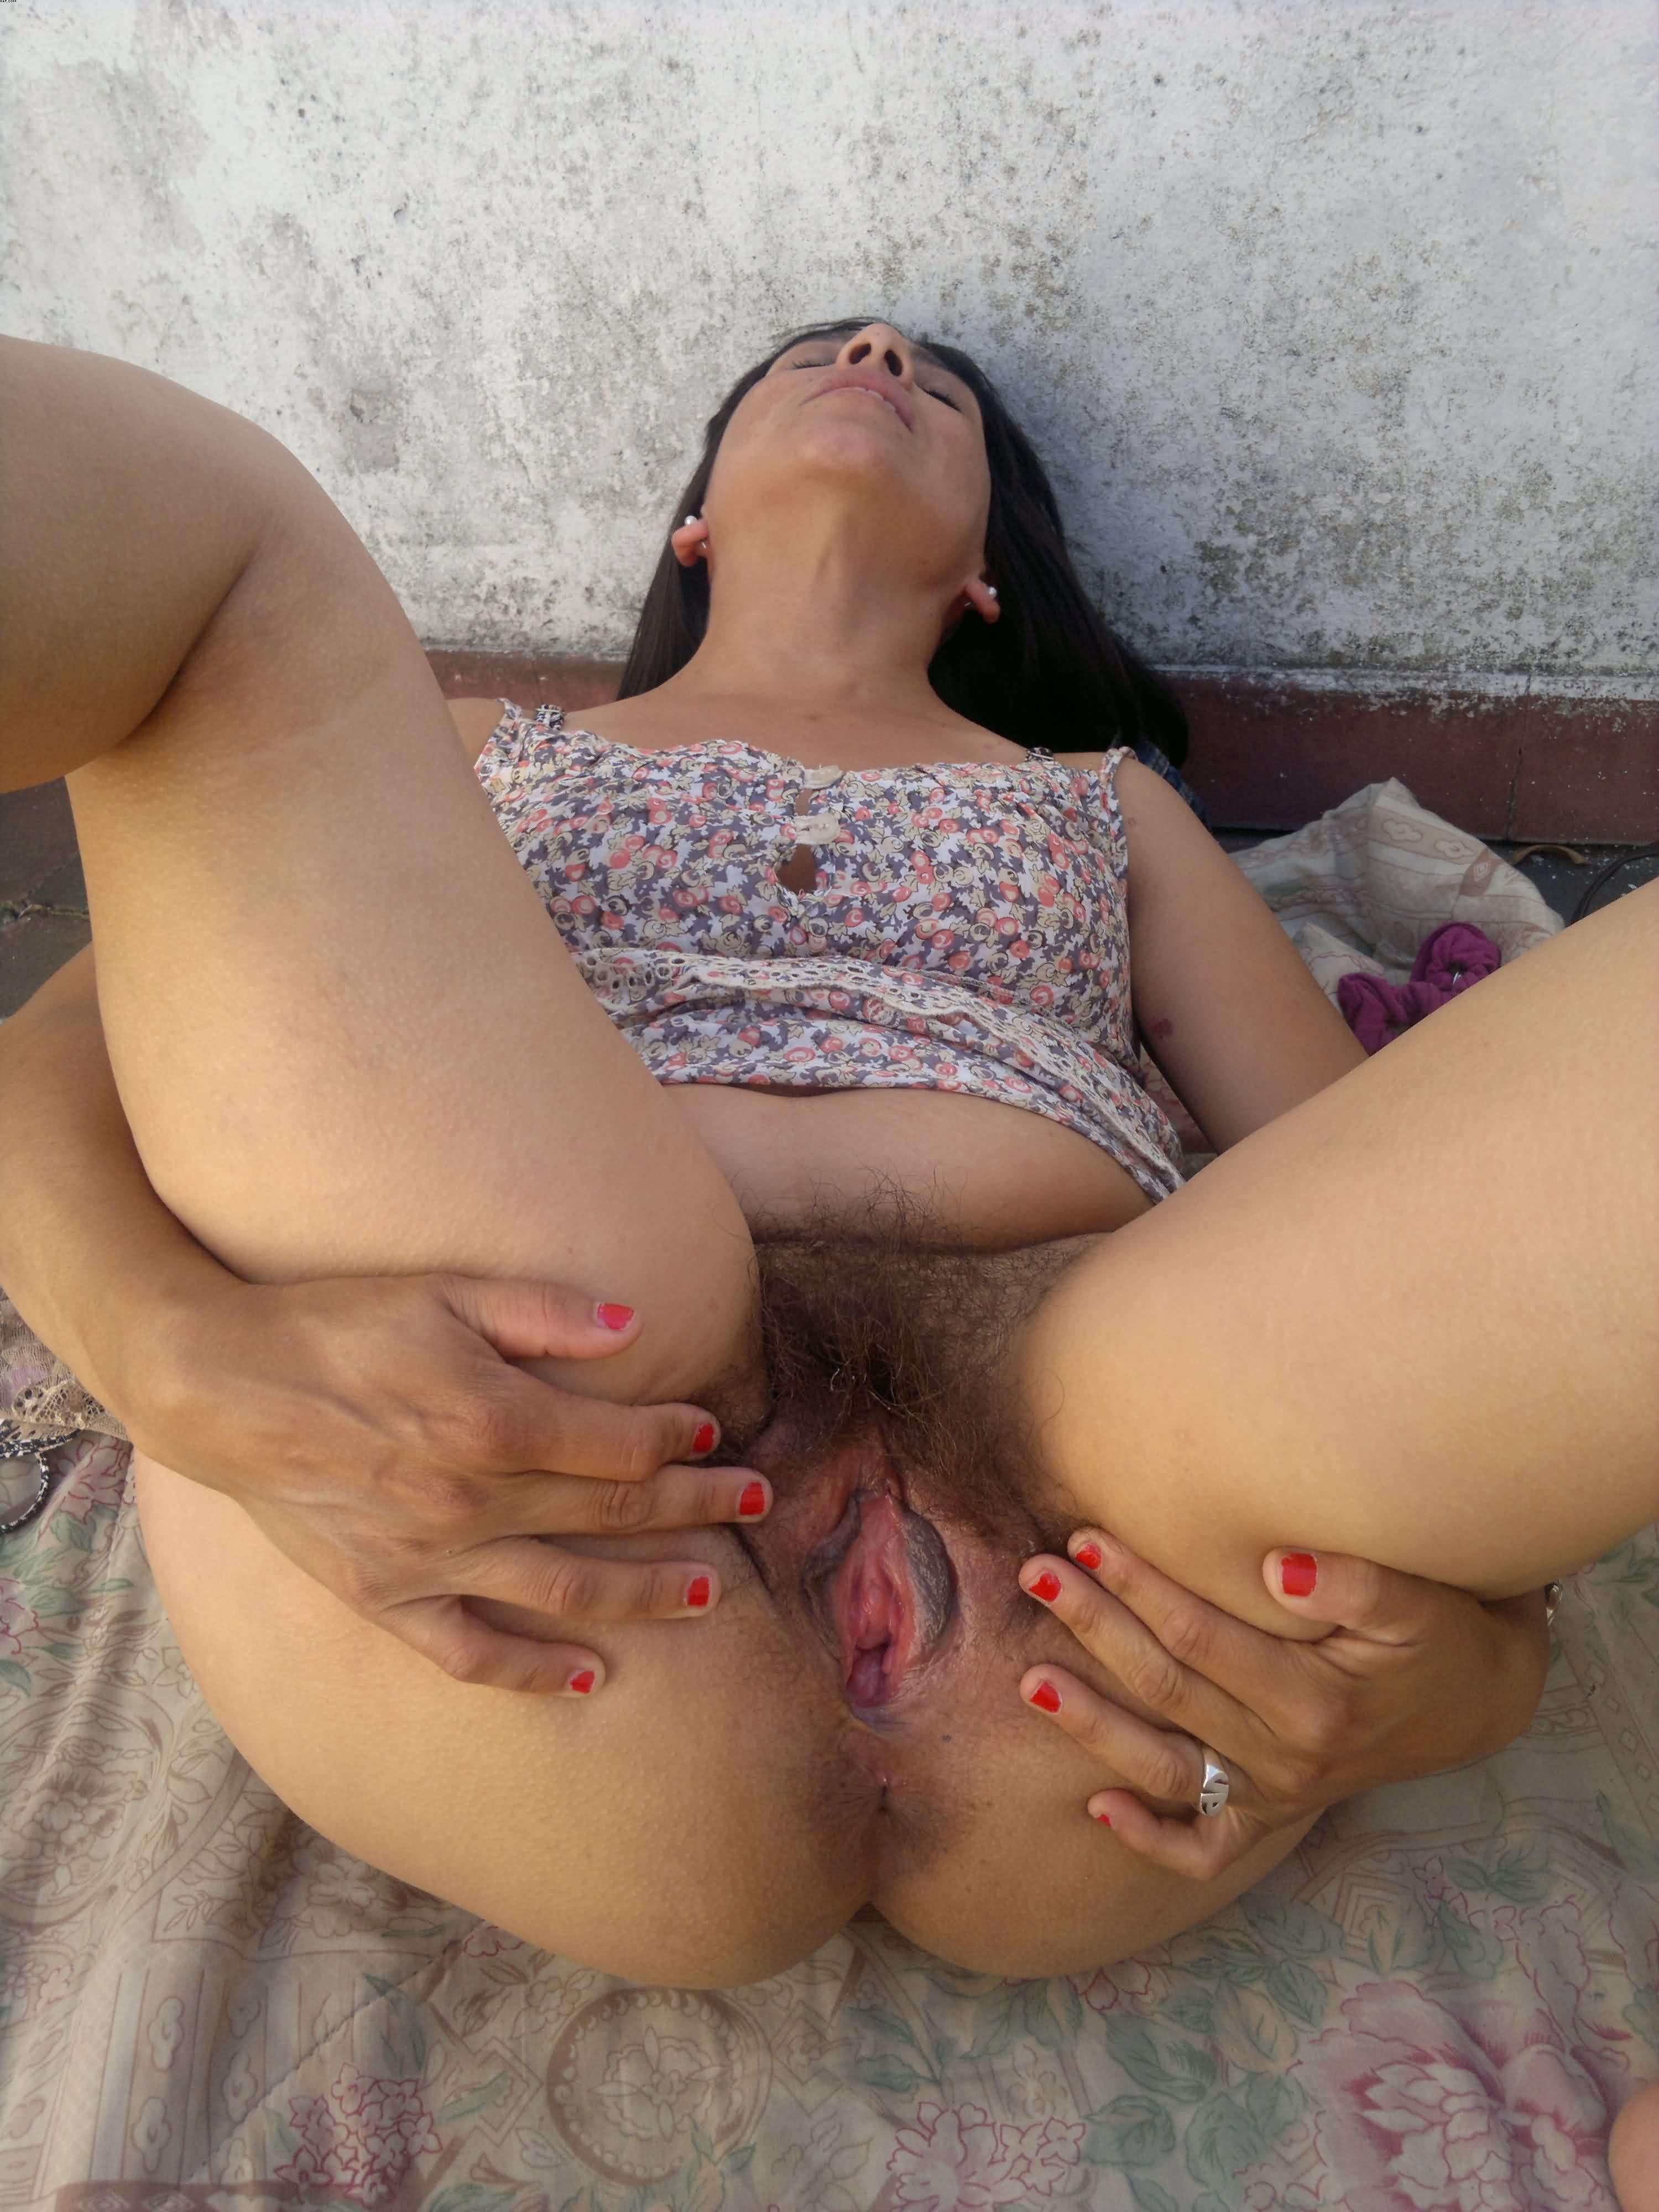 Blonde Hairy Milf Big Tits Hd